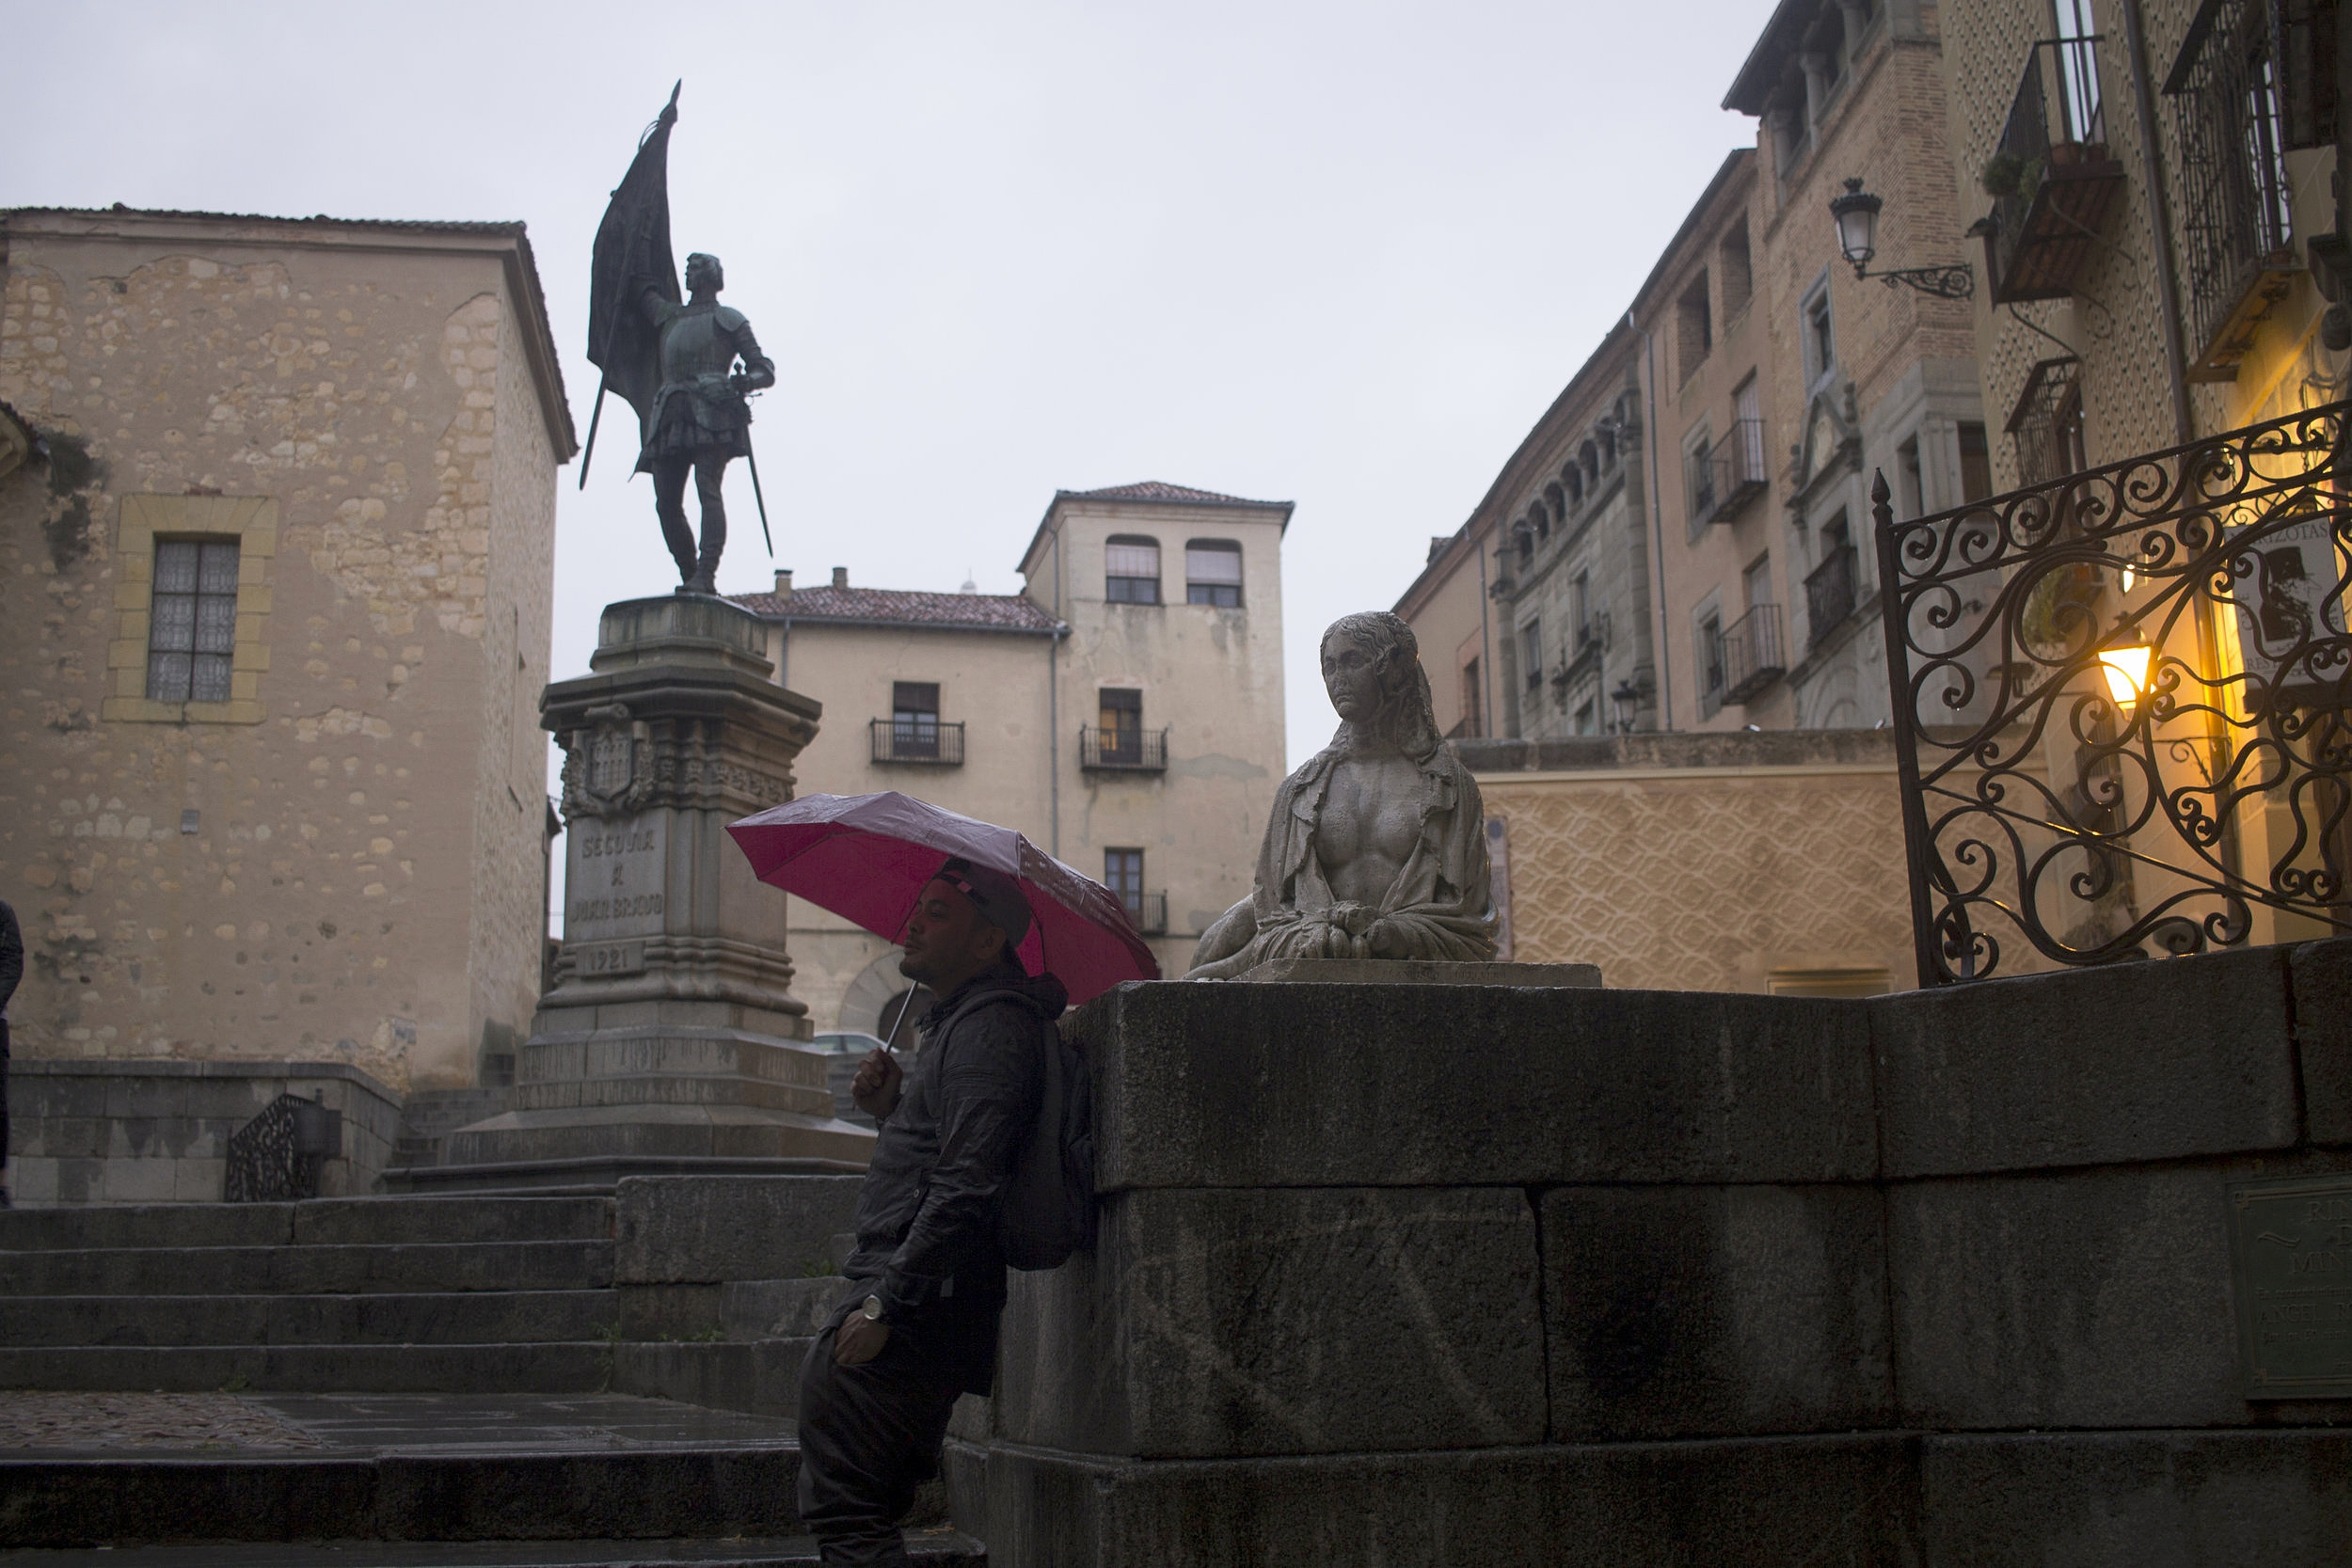 Sometimes it really does rain in Spain.